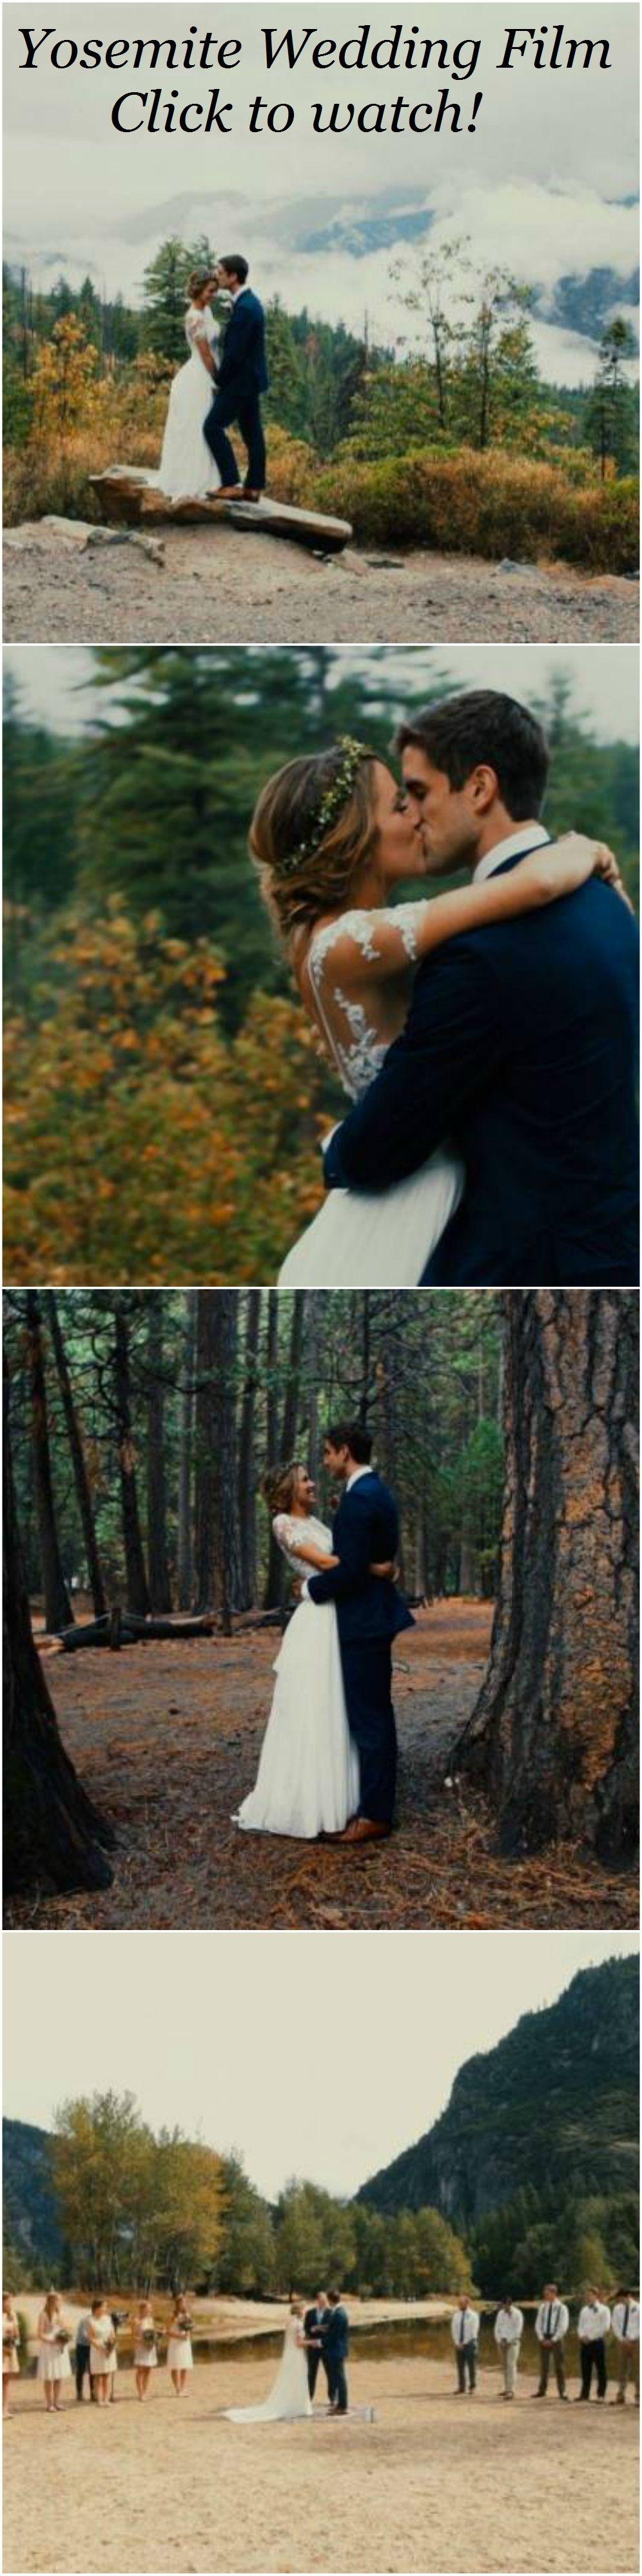 Yosemite wedding film christian ceremony in the california